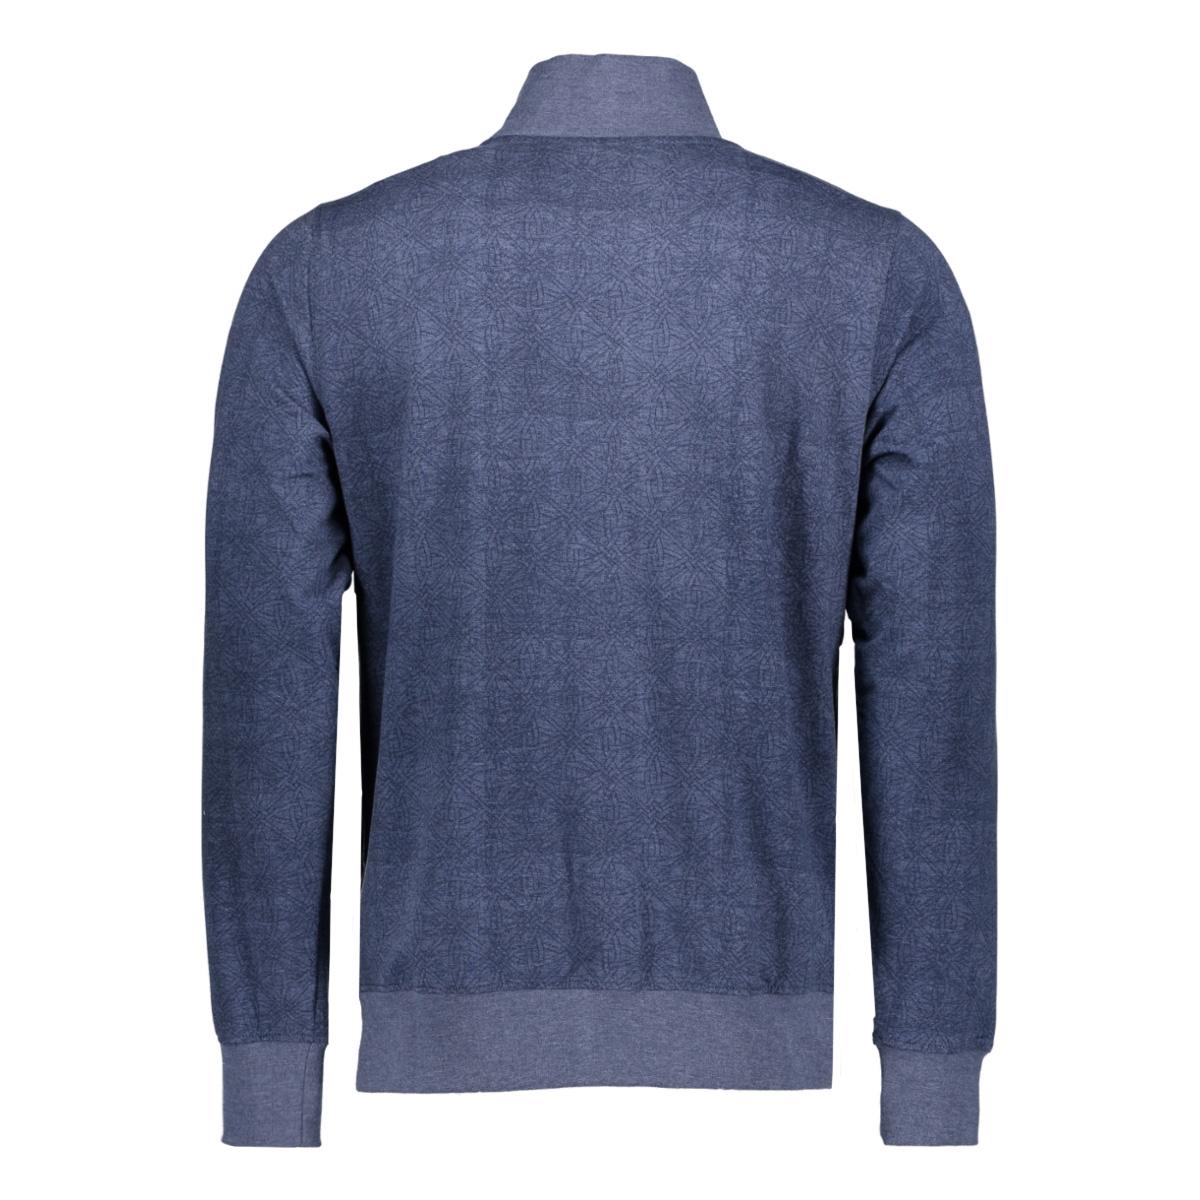 msw751423 twinlife vest insignia